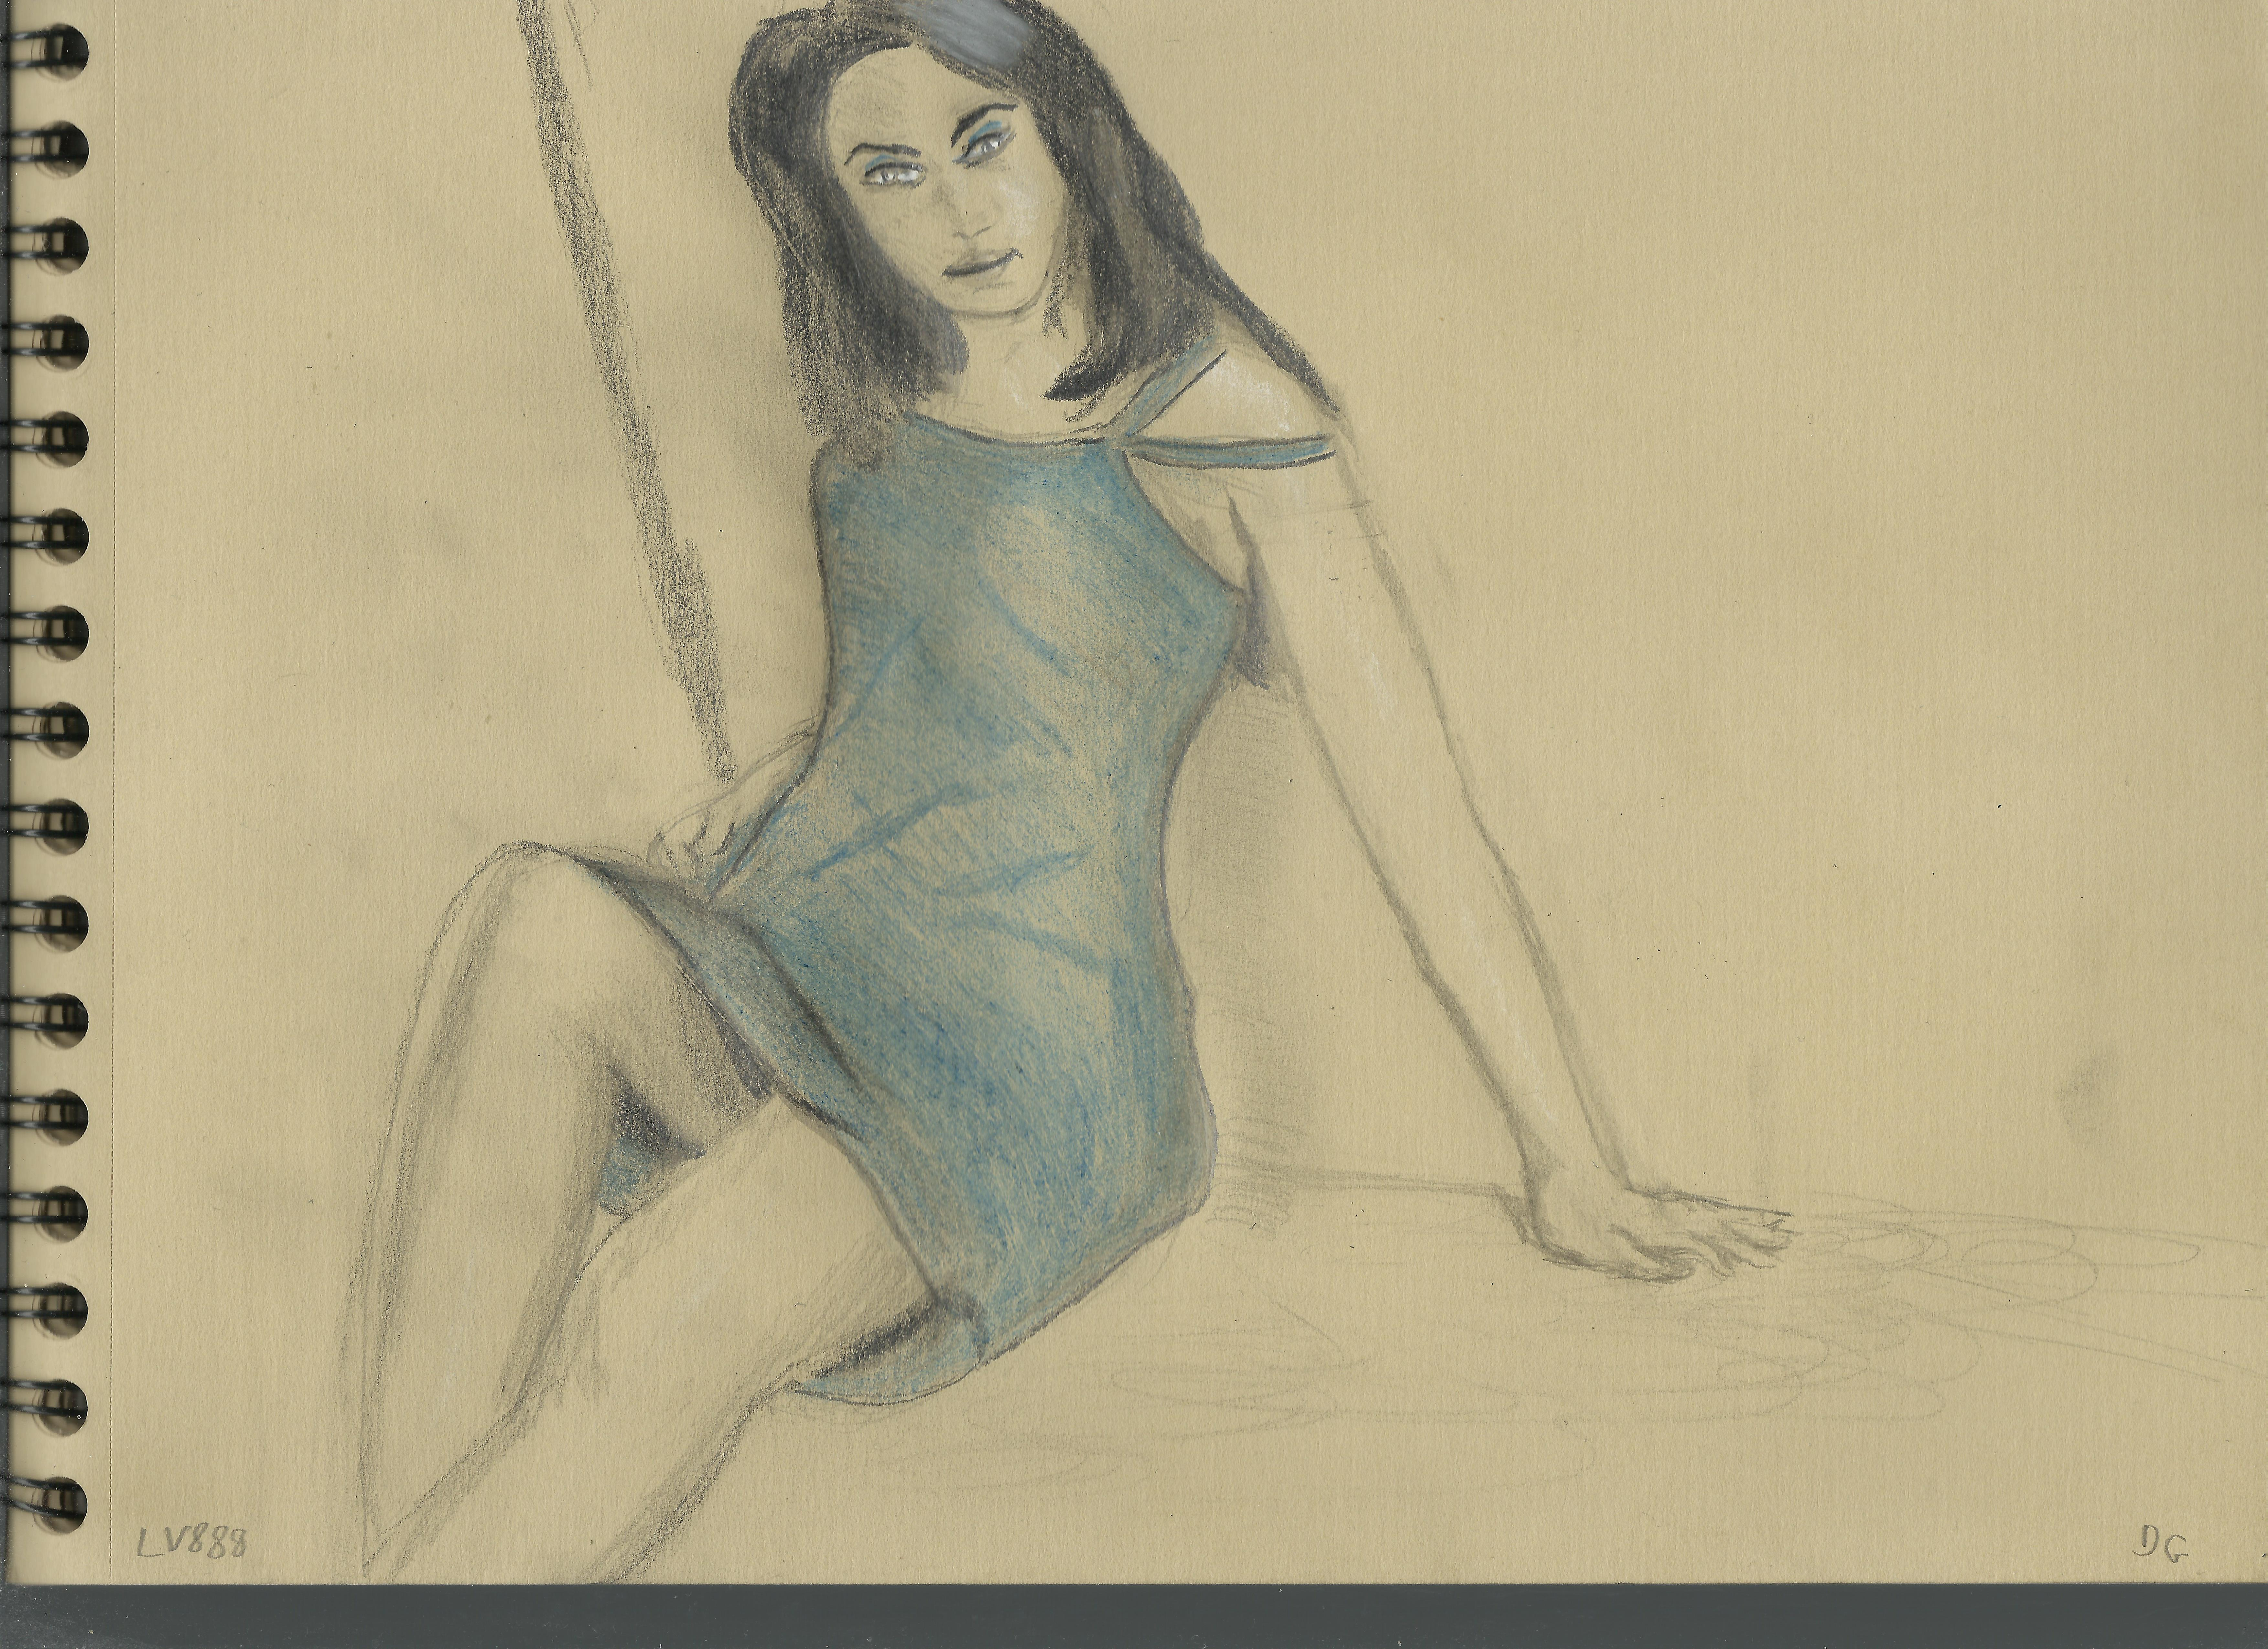 Kraft test - Woman in a Blue Dress v881 by lv888